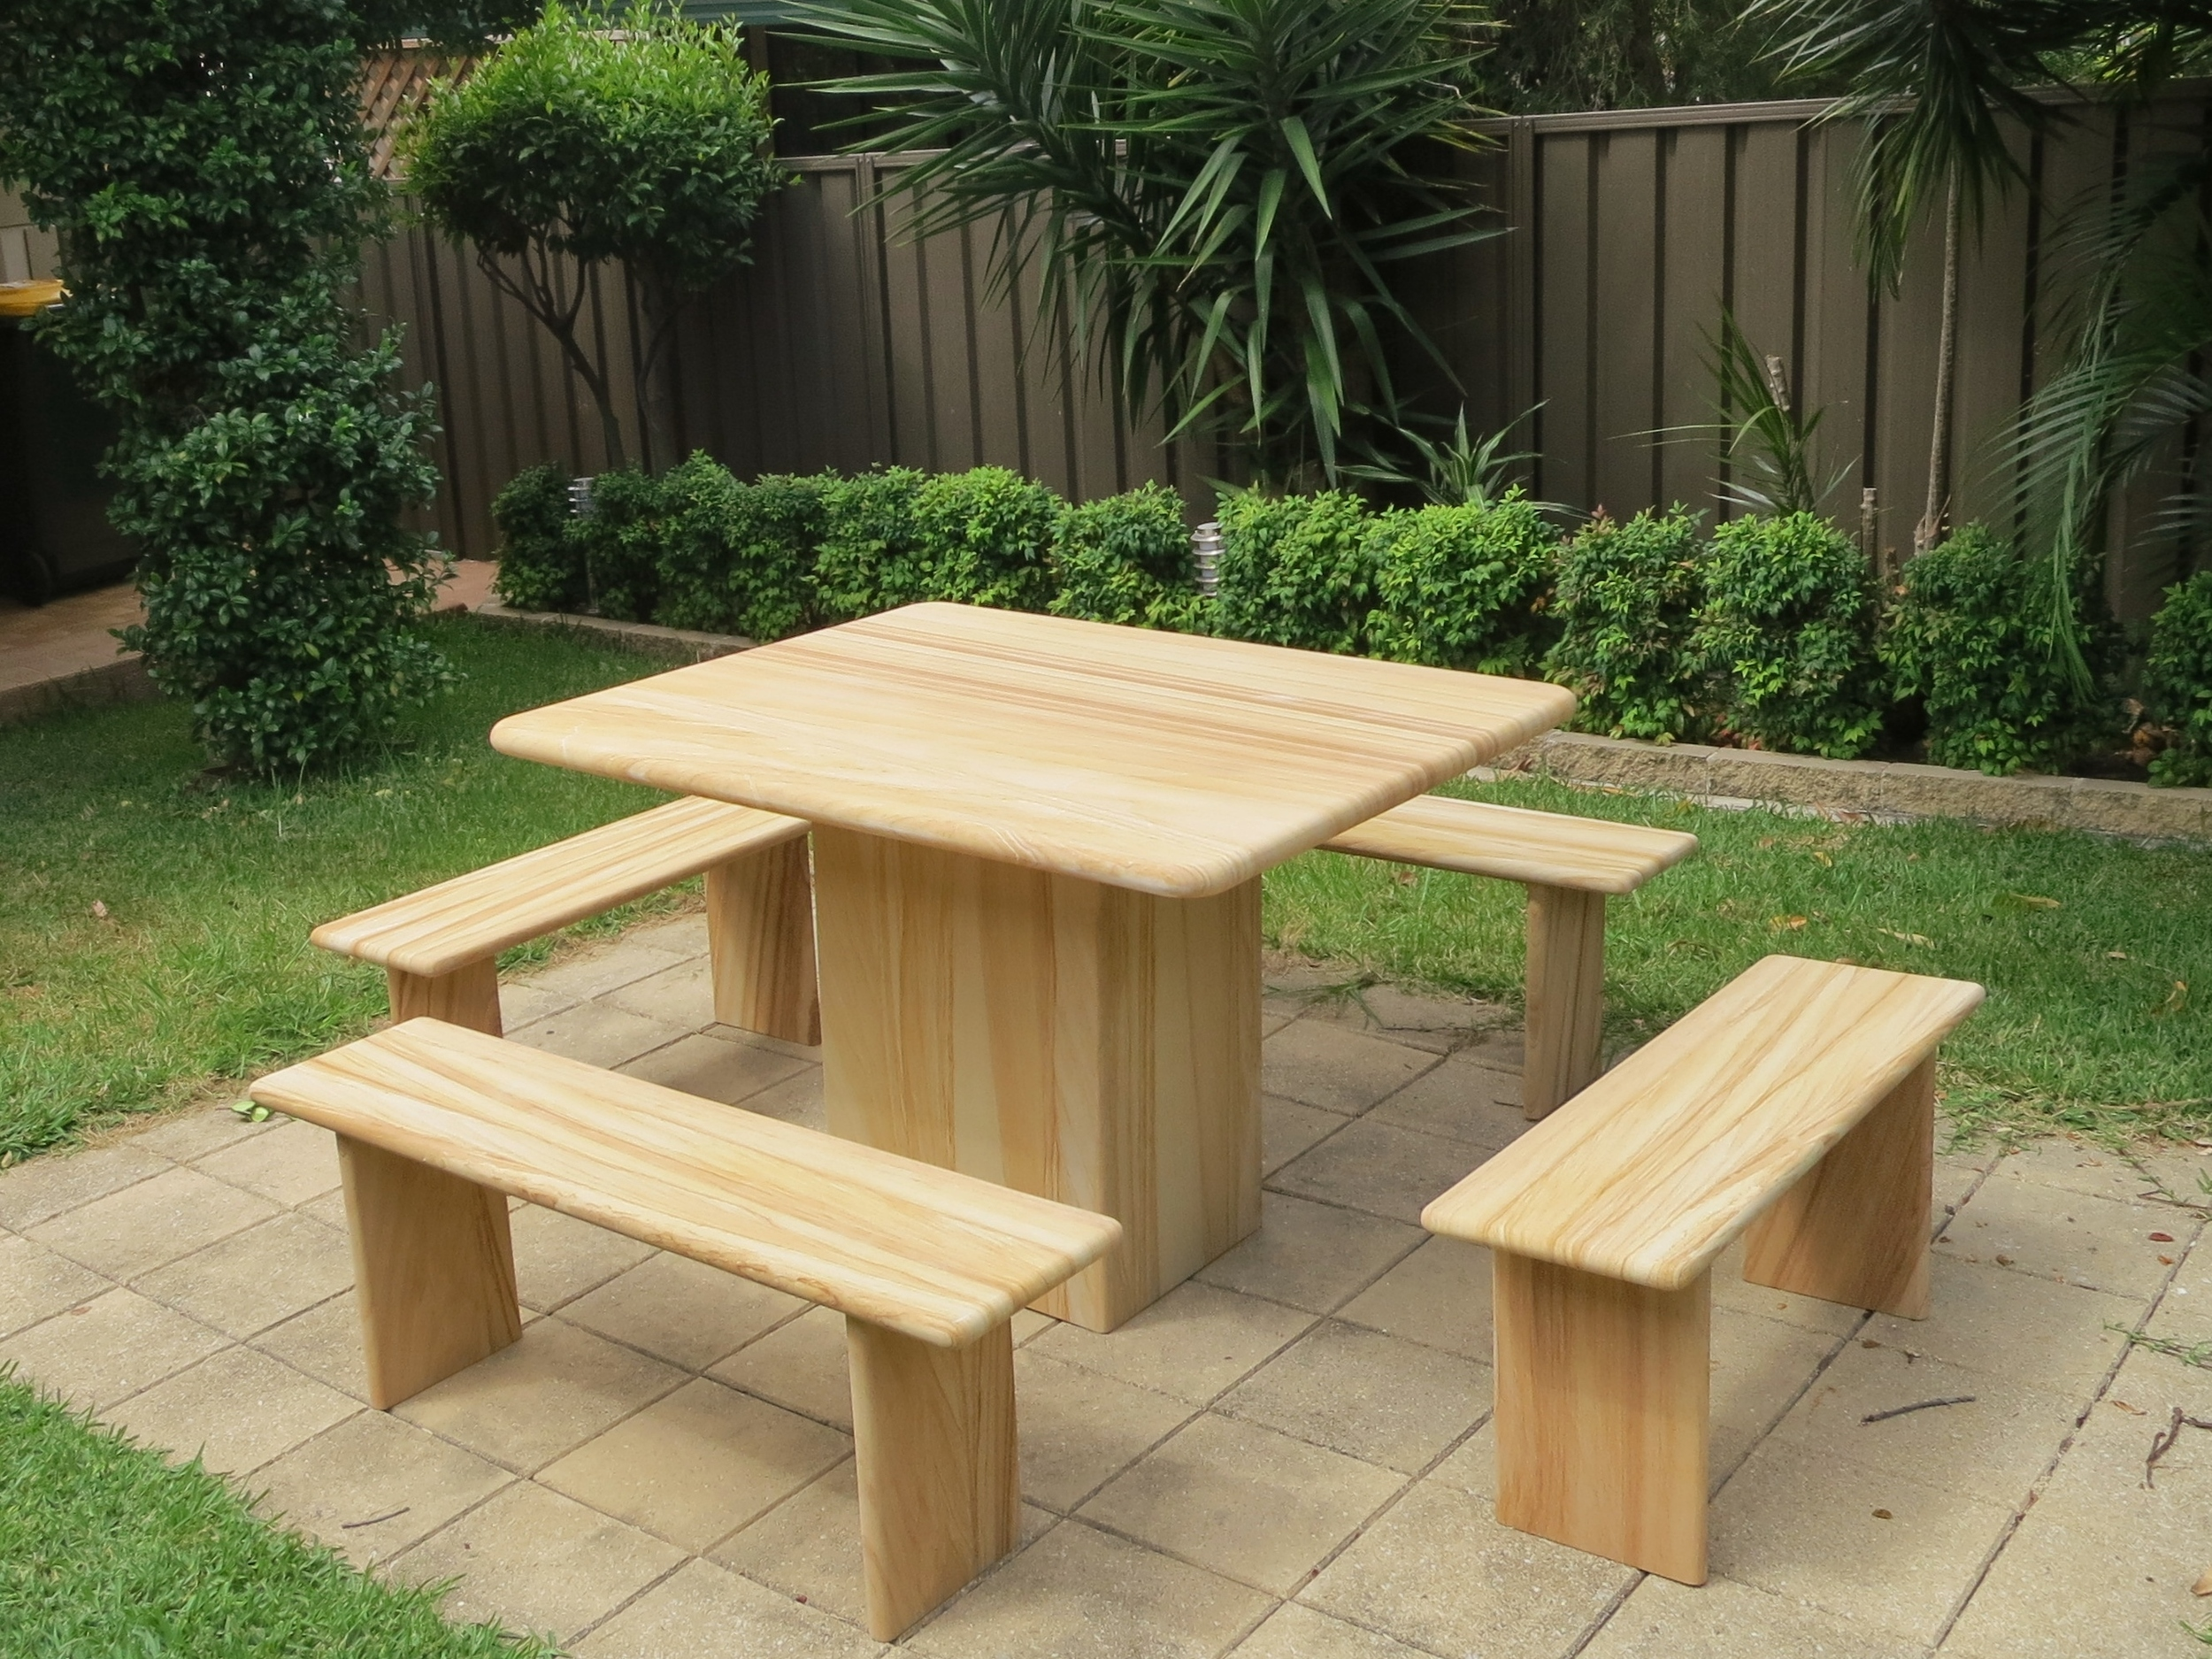 116 Sandstone garden furnniture custom made from woodgrain tough sandstone $2000.JPG